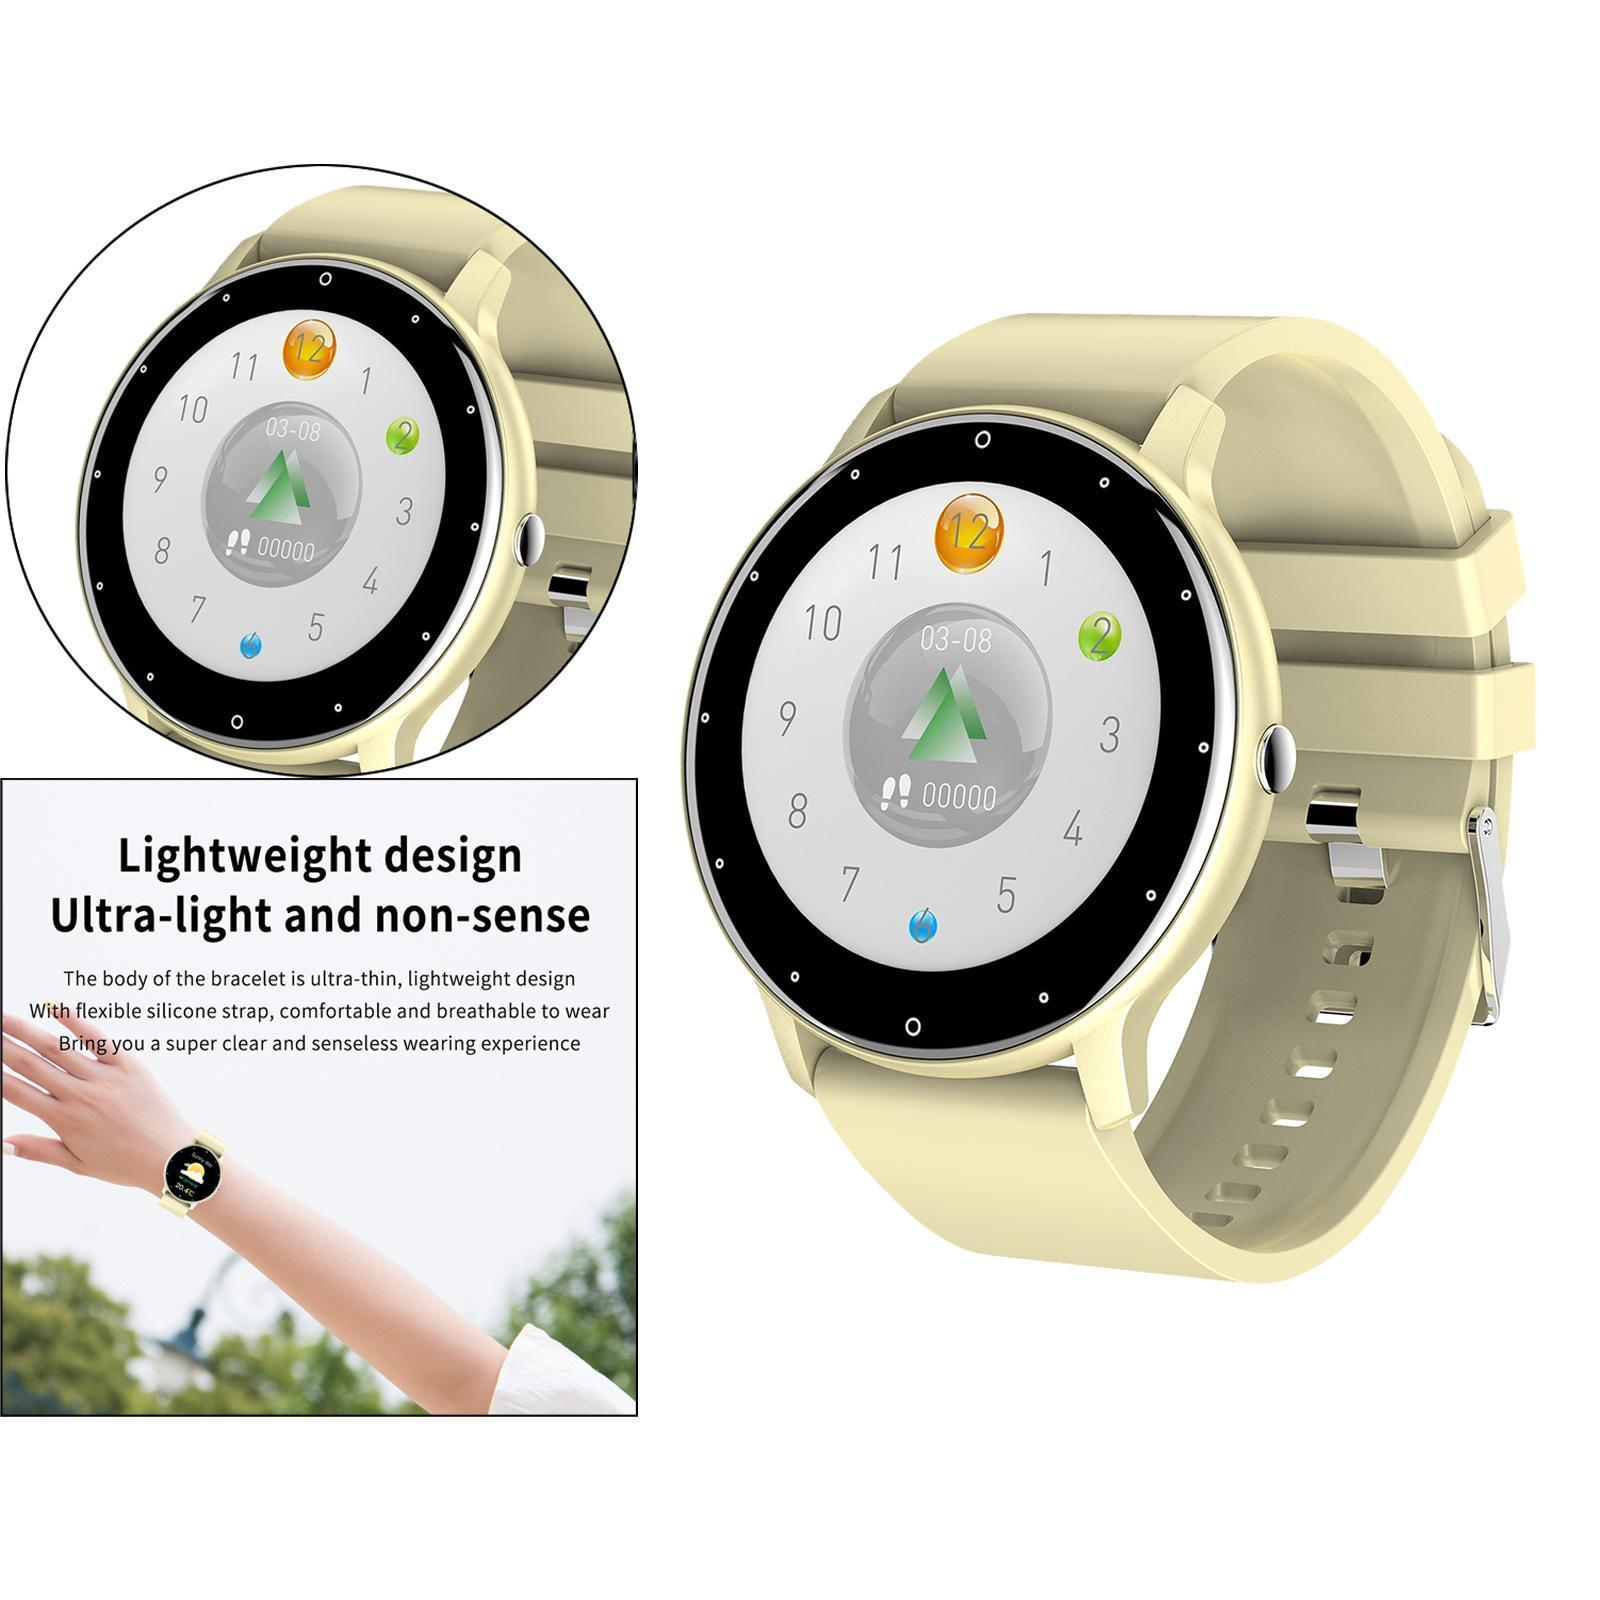 miniature 32 - Étanche Femmes Montre Intelligente Bracelet Sport Fitness Tracker Mode